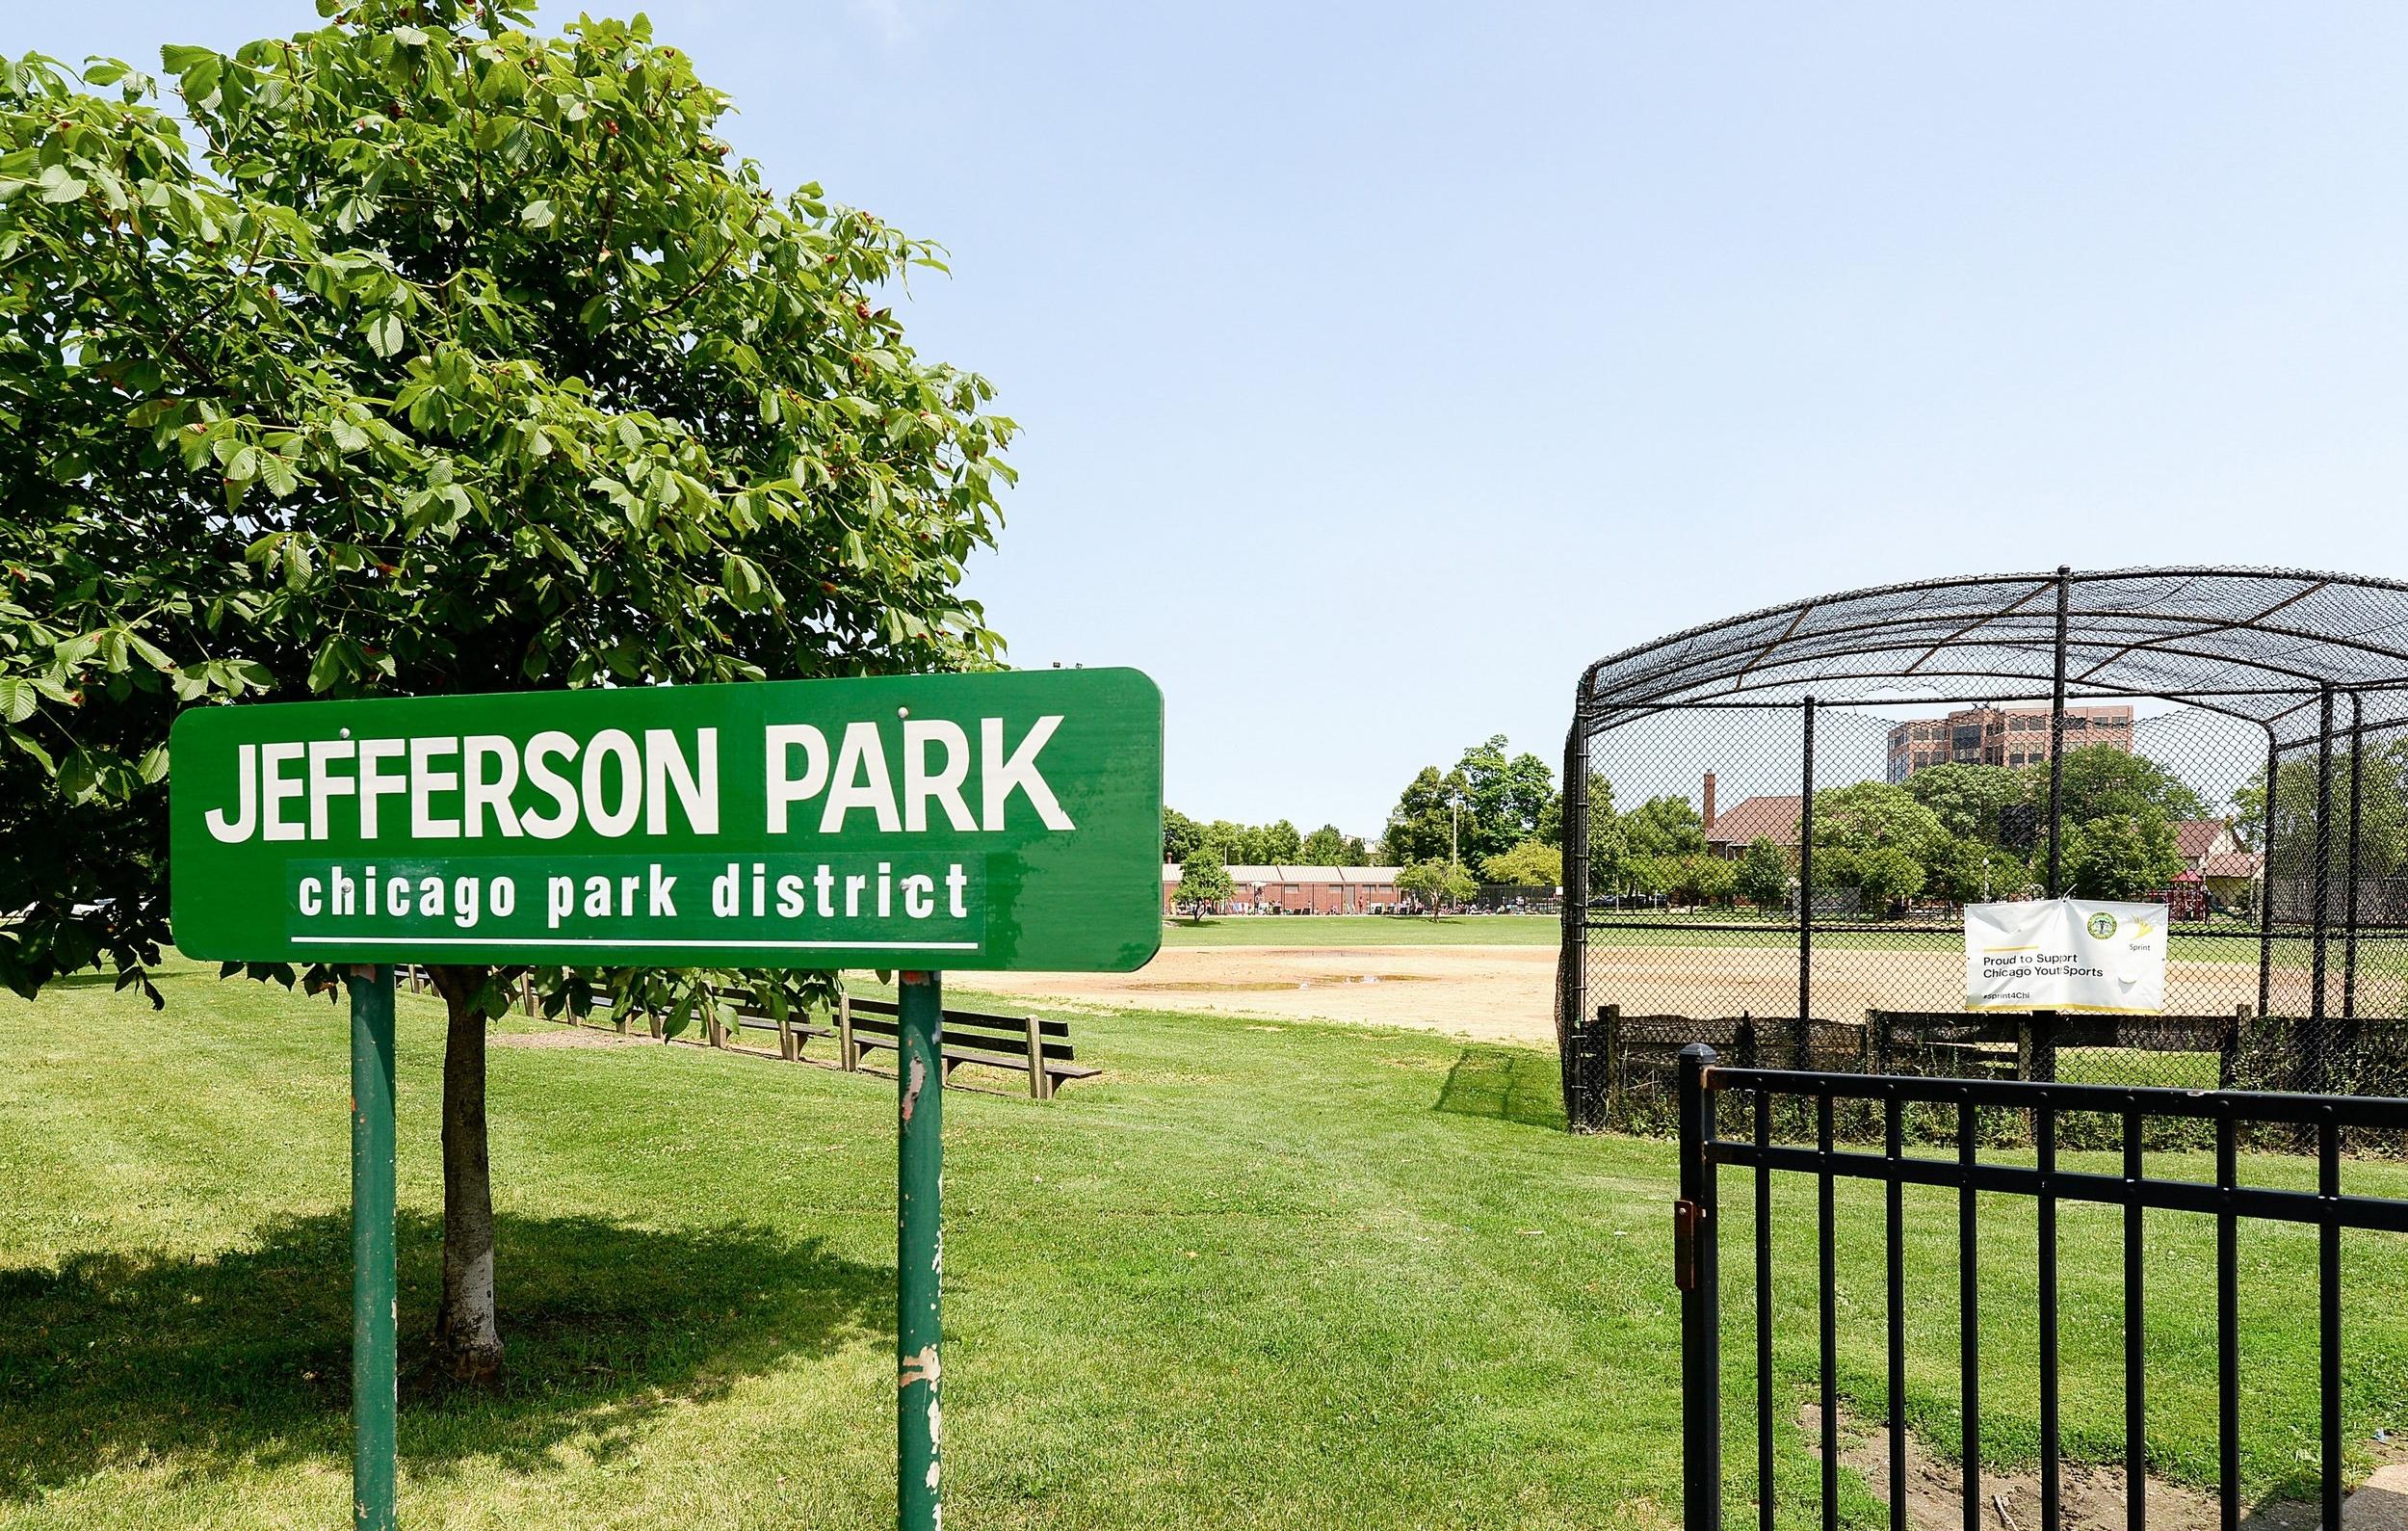 Jefferson Park Chicago